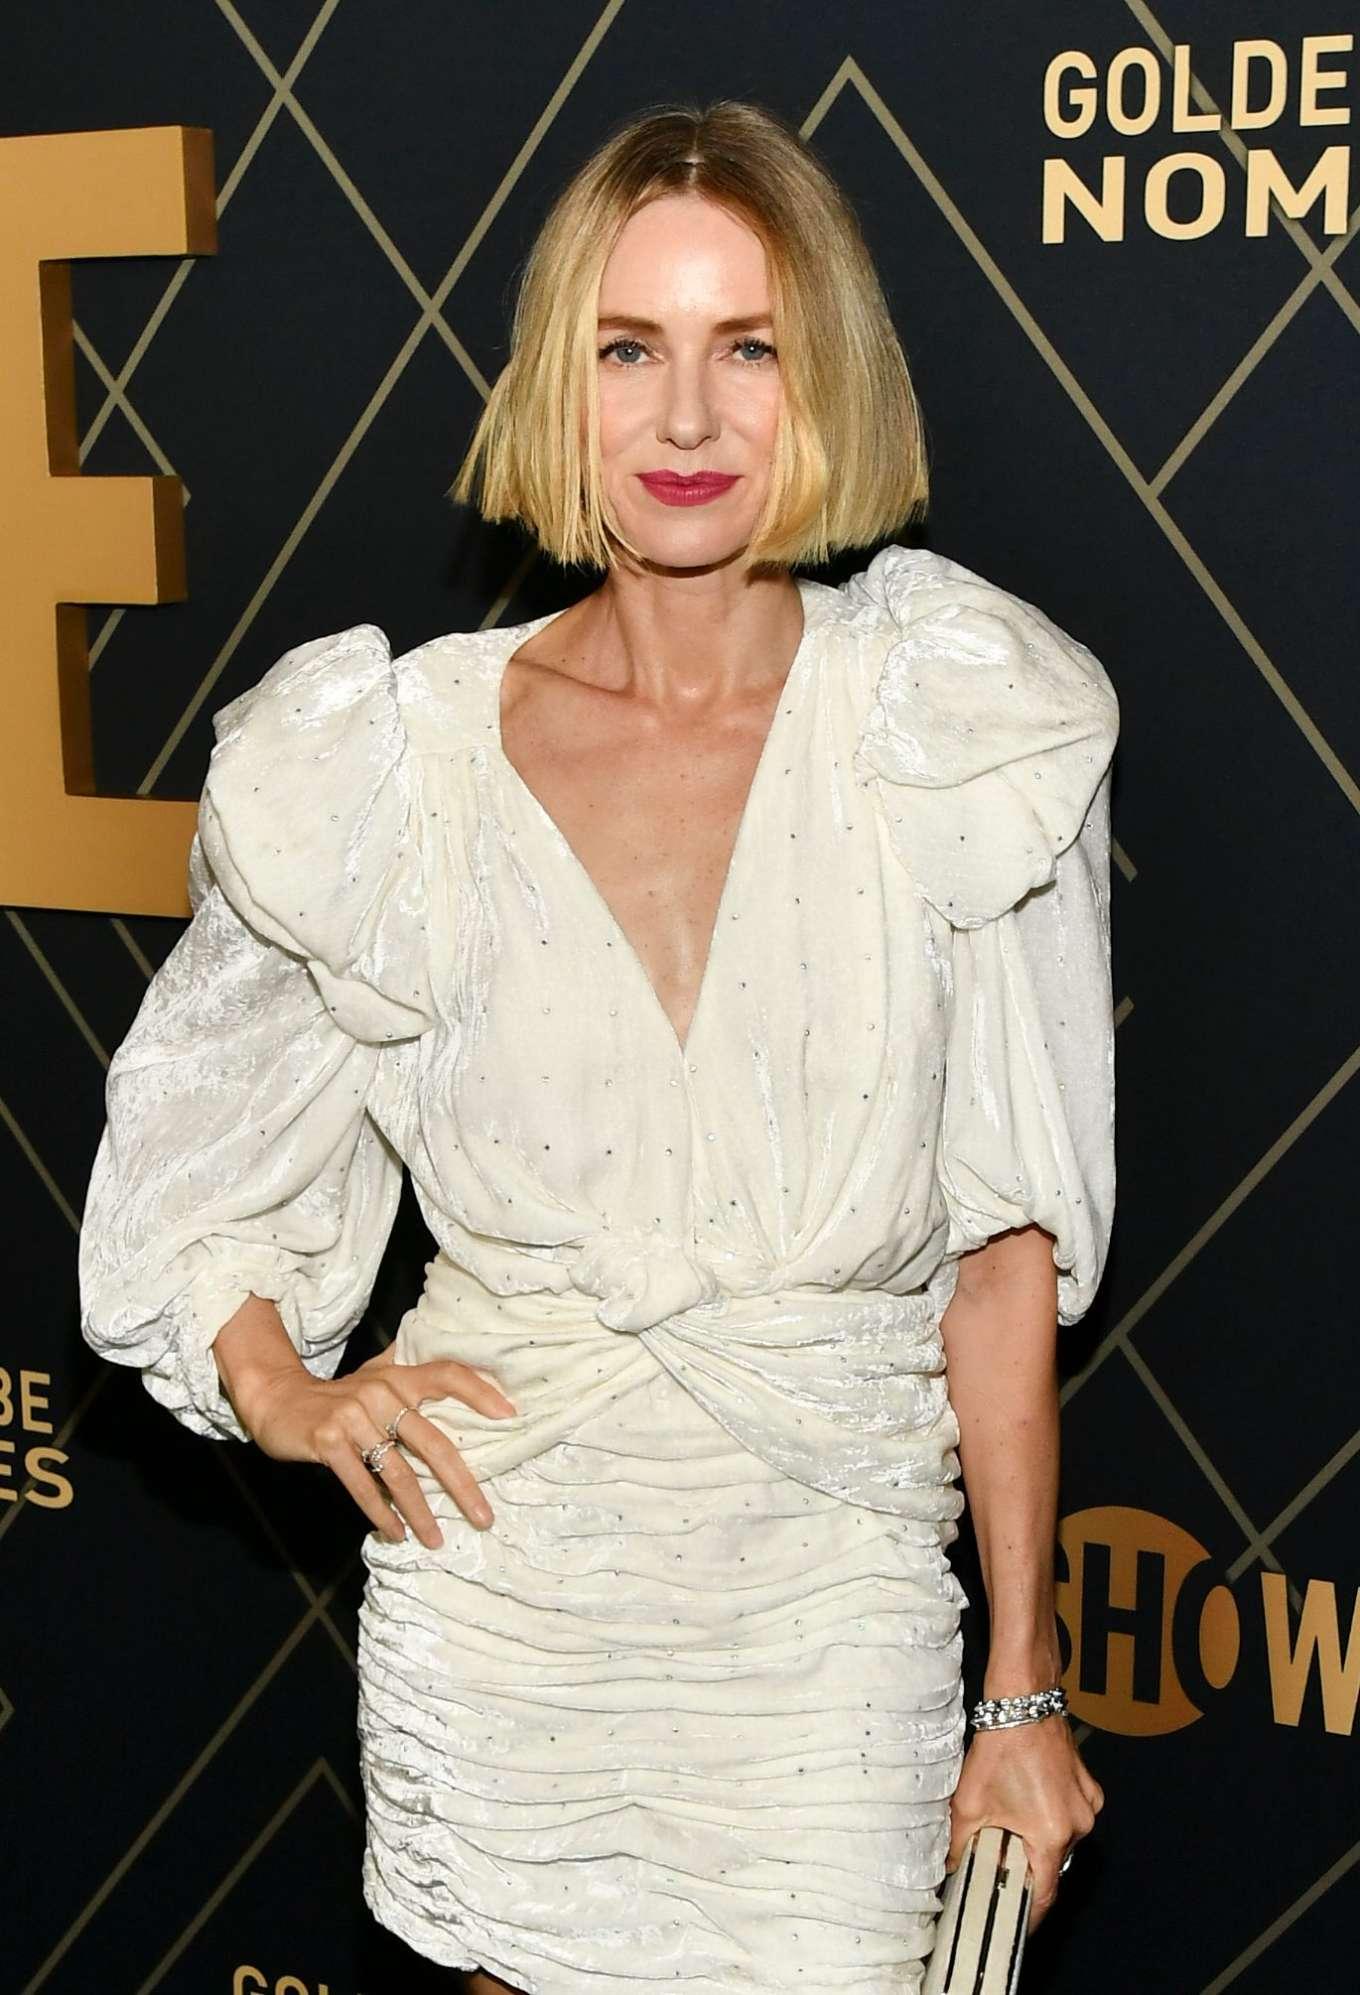 Naomi Watts - Showtime Golden Globe Nominees Celebration in Los Angeles